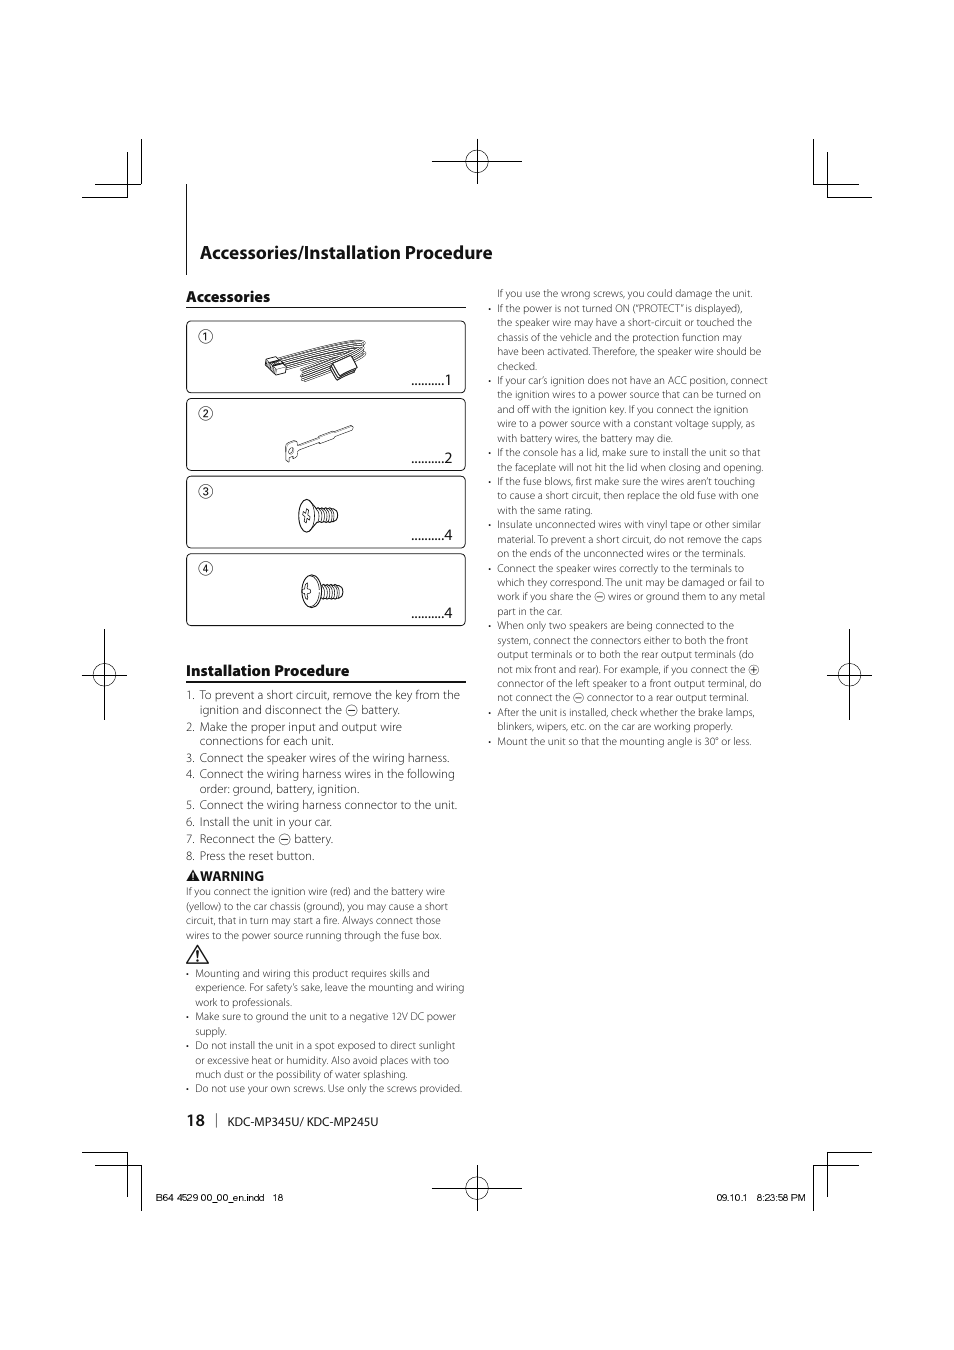 Accessories/installation procedure, Accessories 1, Installation procedure | Kenwood  KDC-MP345U User Manual | Page 18 / 68